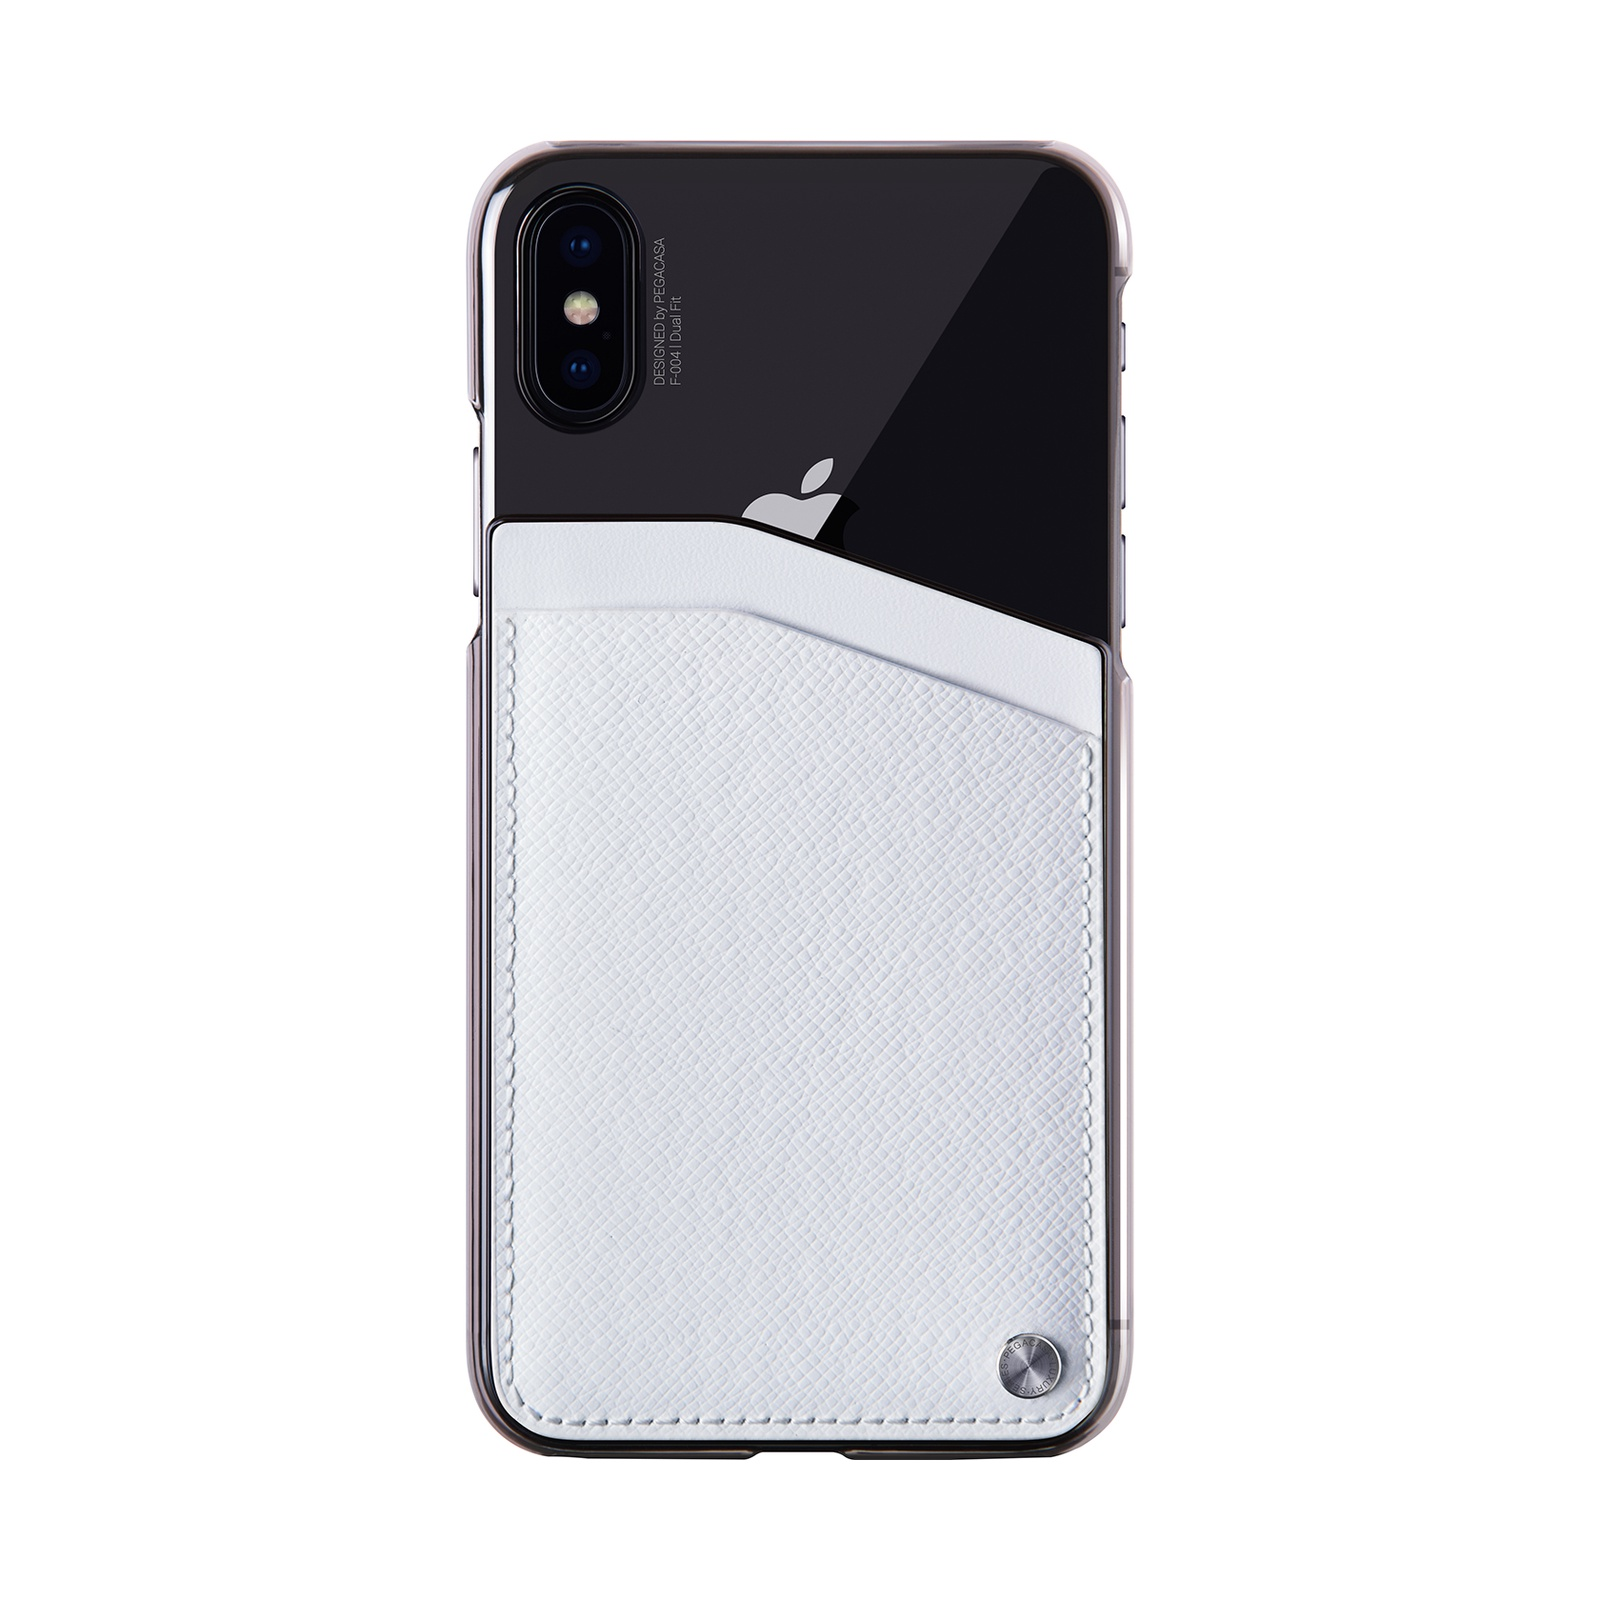 Фото - Чехол для сотового телефона PEGACASA F-004 Dual Fit для iPhone XS/X, белый calmoon 004 high quality dual ring detachable keychain keyring black silver